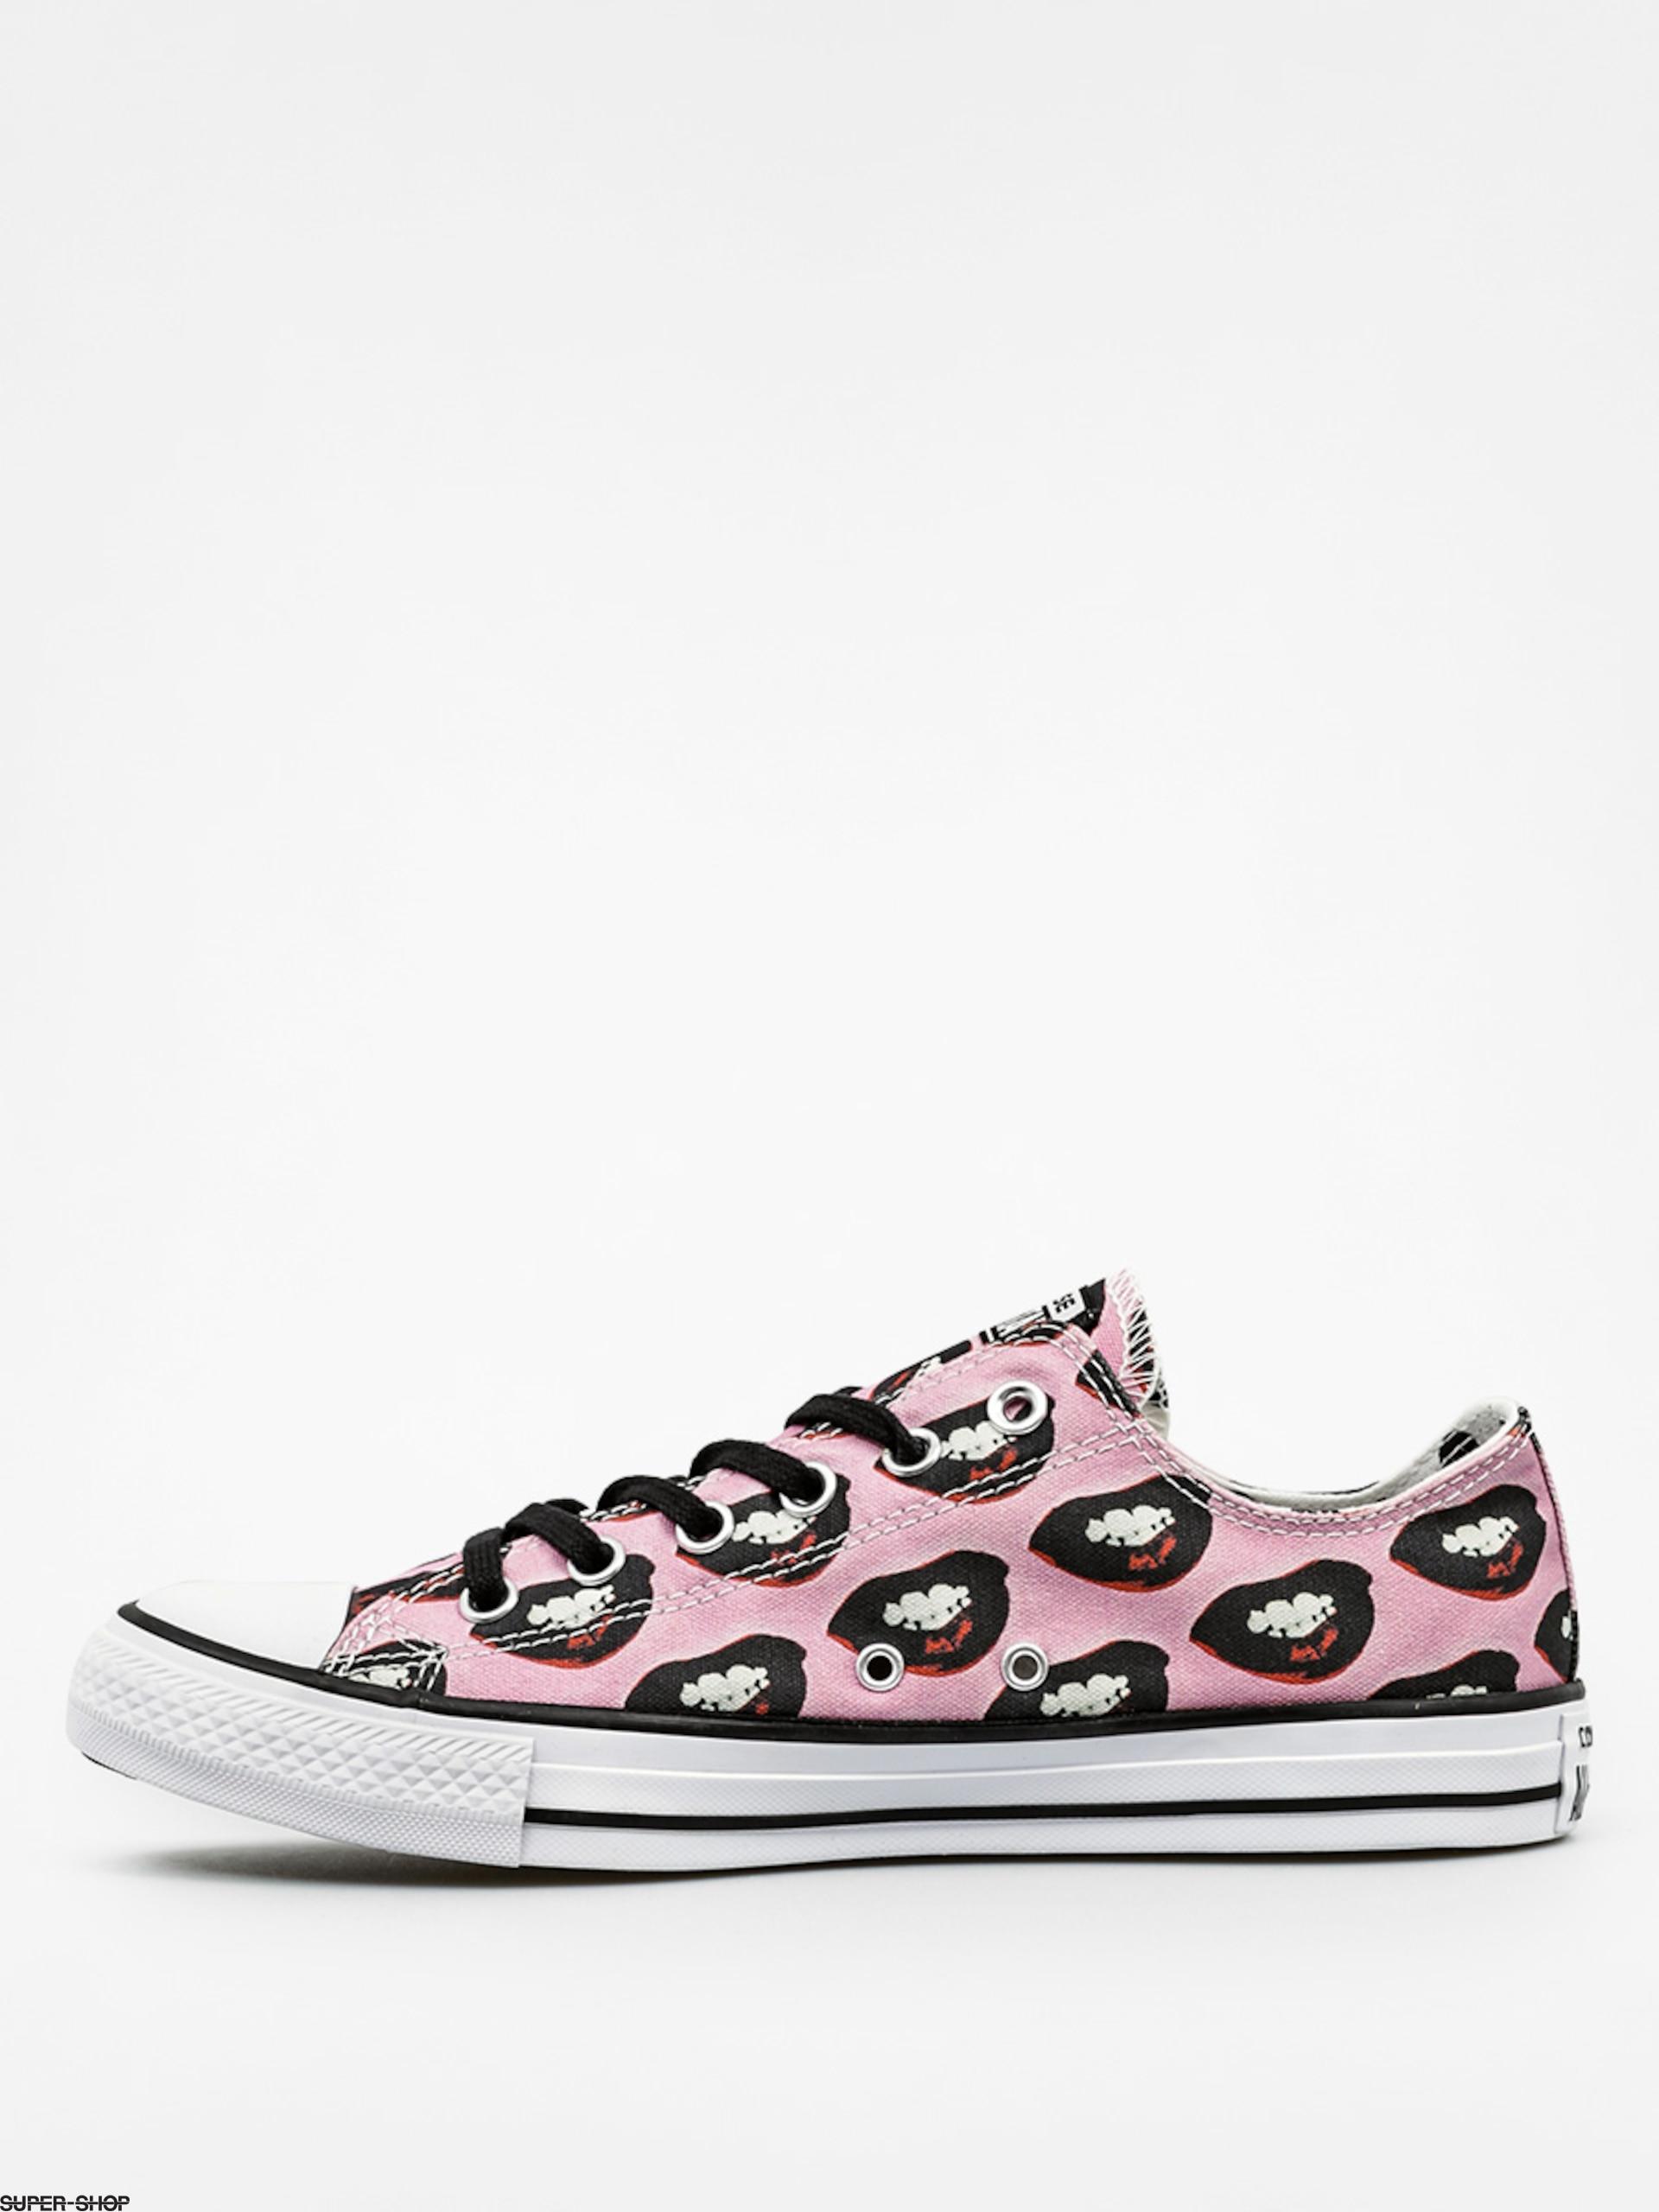 229f64775a46 Converse Chucks Chuck Taylor All Star Ox (white black multi pink)